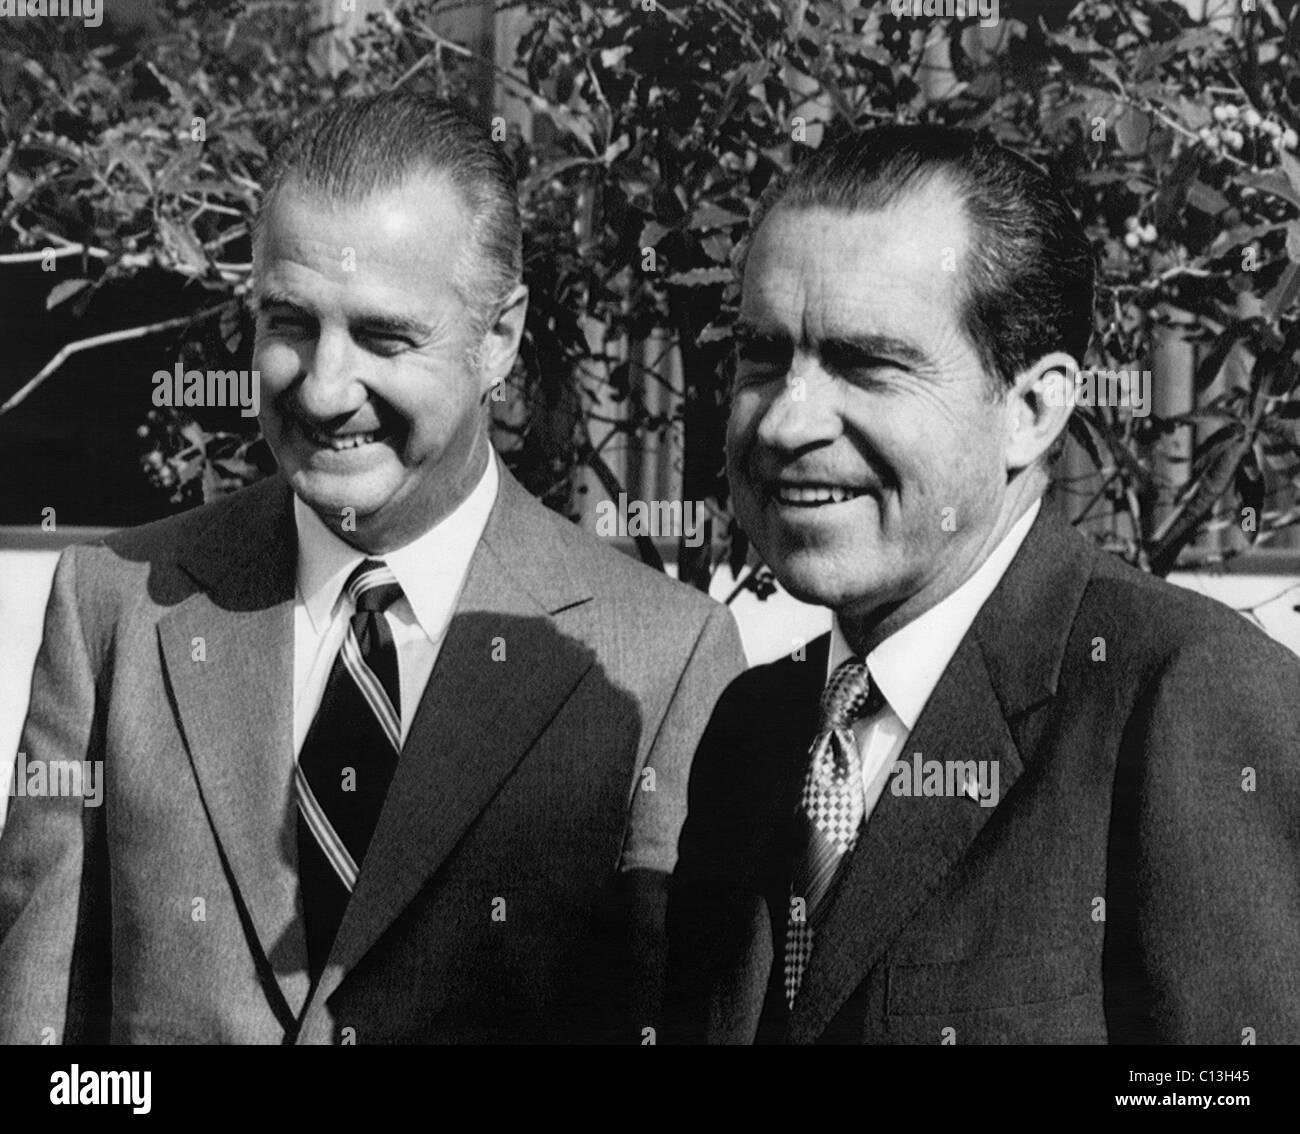 Who Was Richard Nixon Vice President: 1970 Richard Nixon Stock Photos & 1970 Richard Nixon Stock